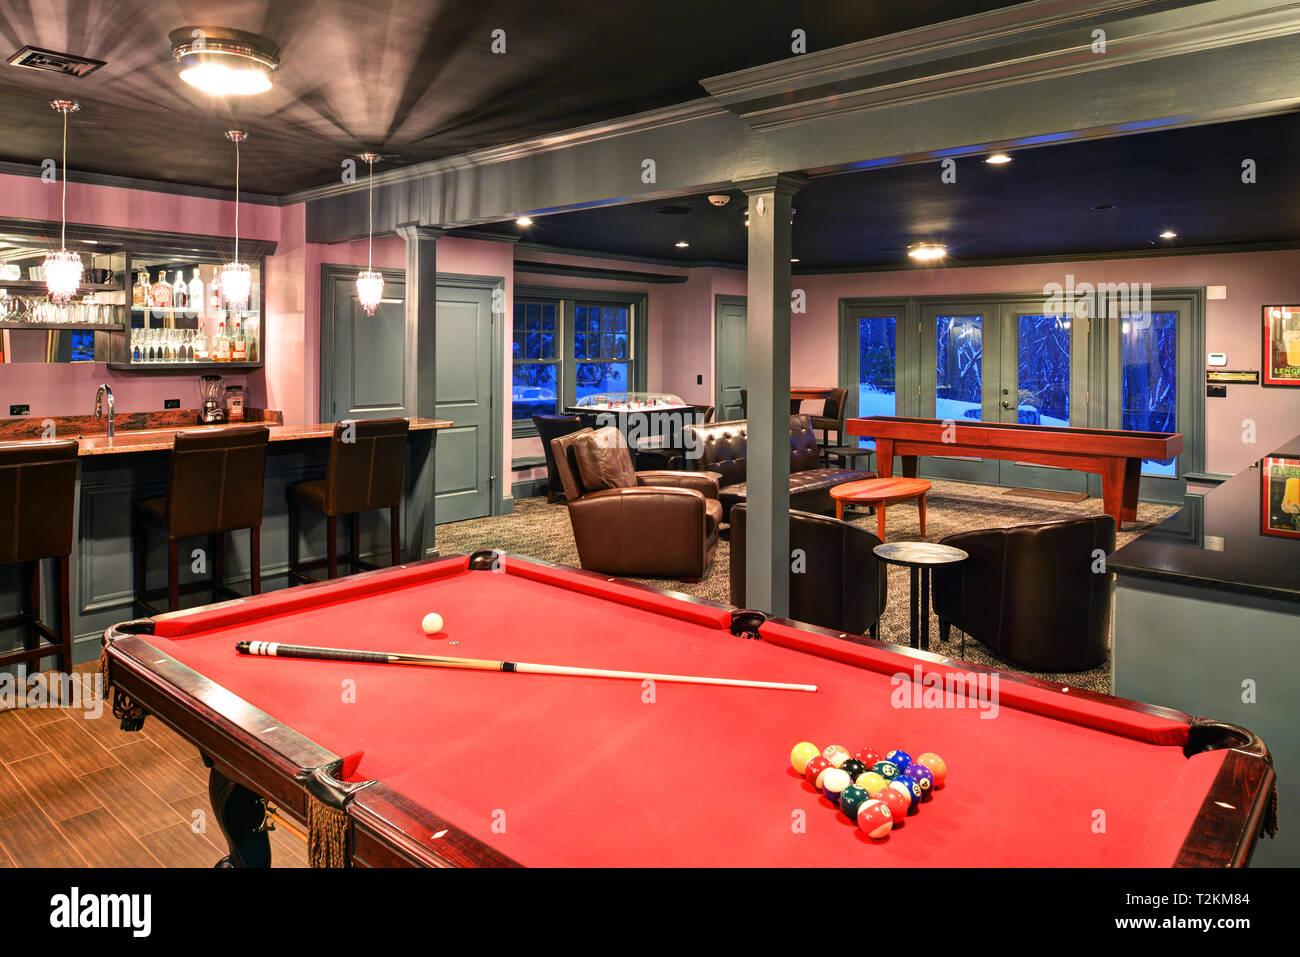 salle de loisirs. sous-sol fini avec bar, table de billard